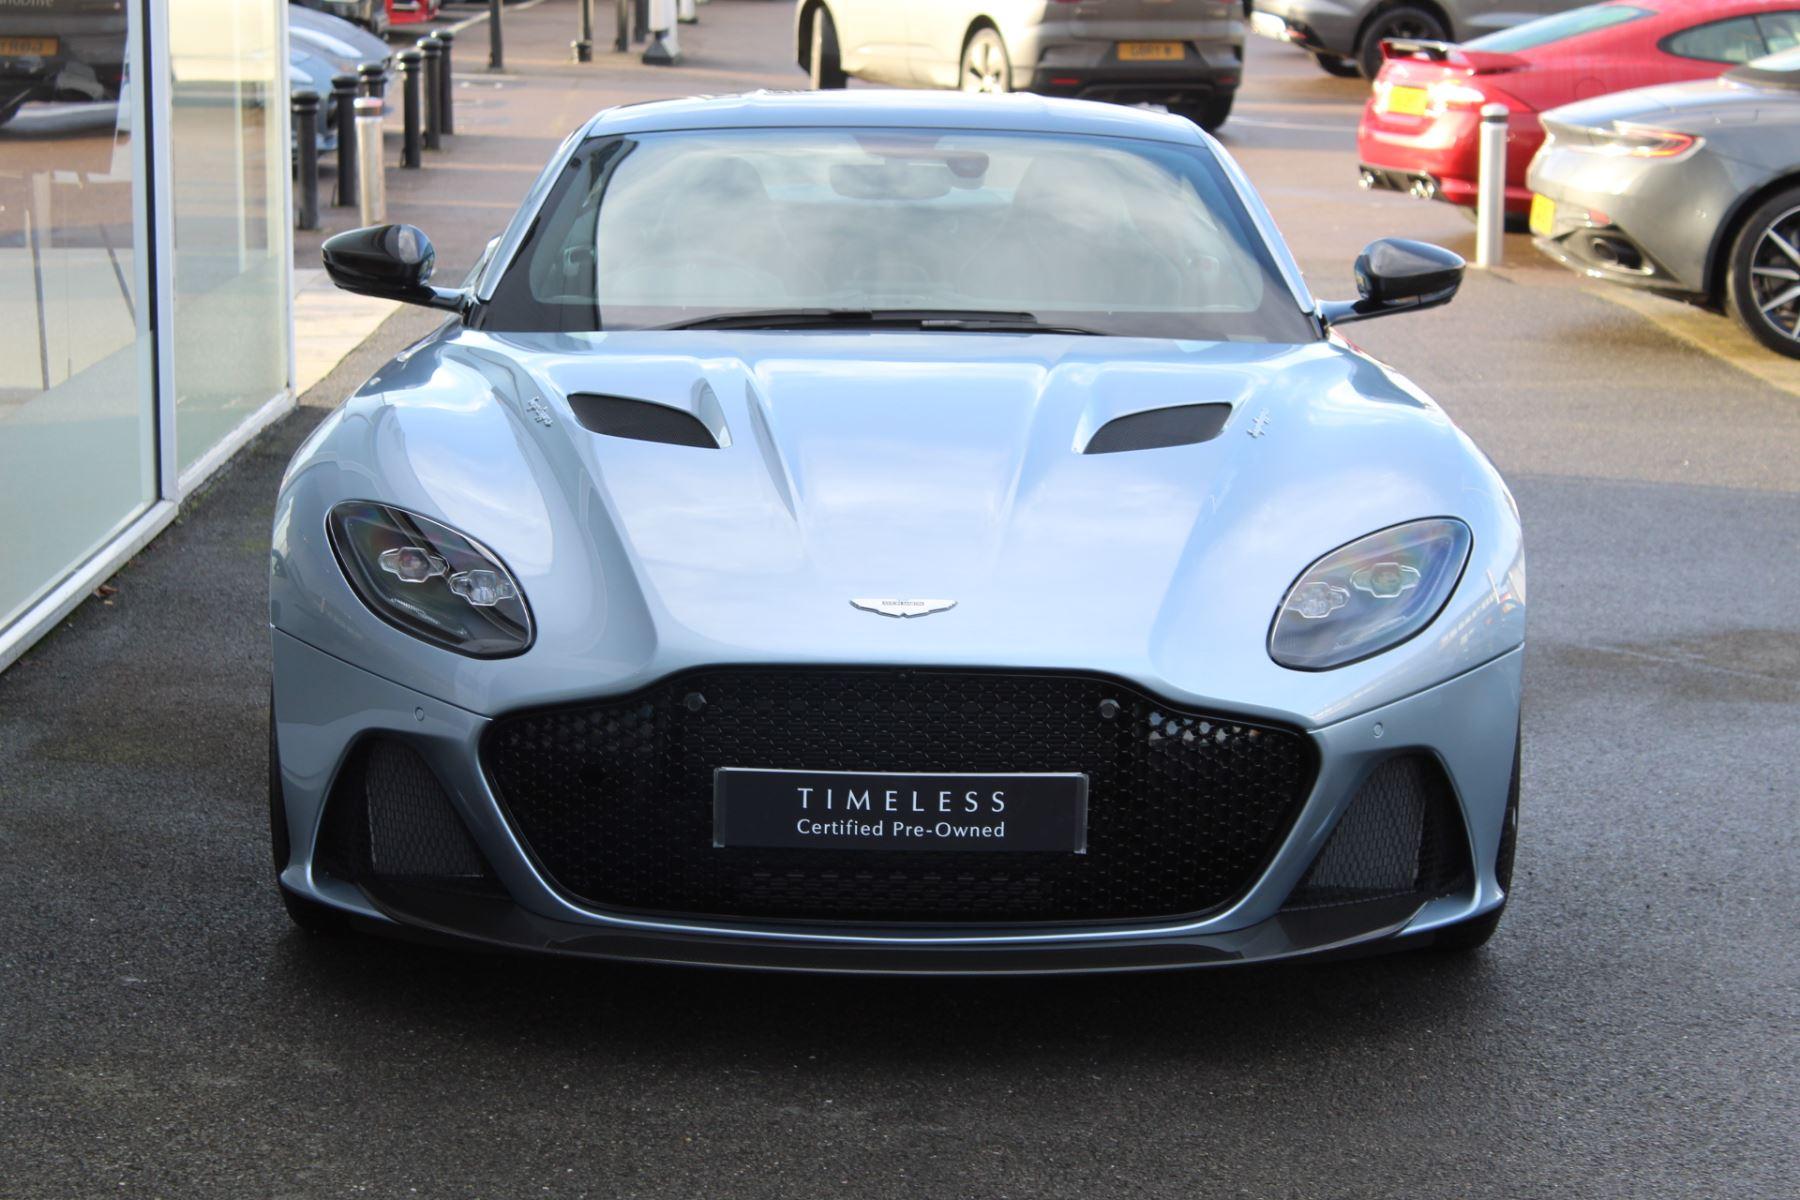 Aston Martin DBS Superleggera V12 2dr Touchtronic image 6